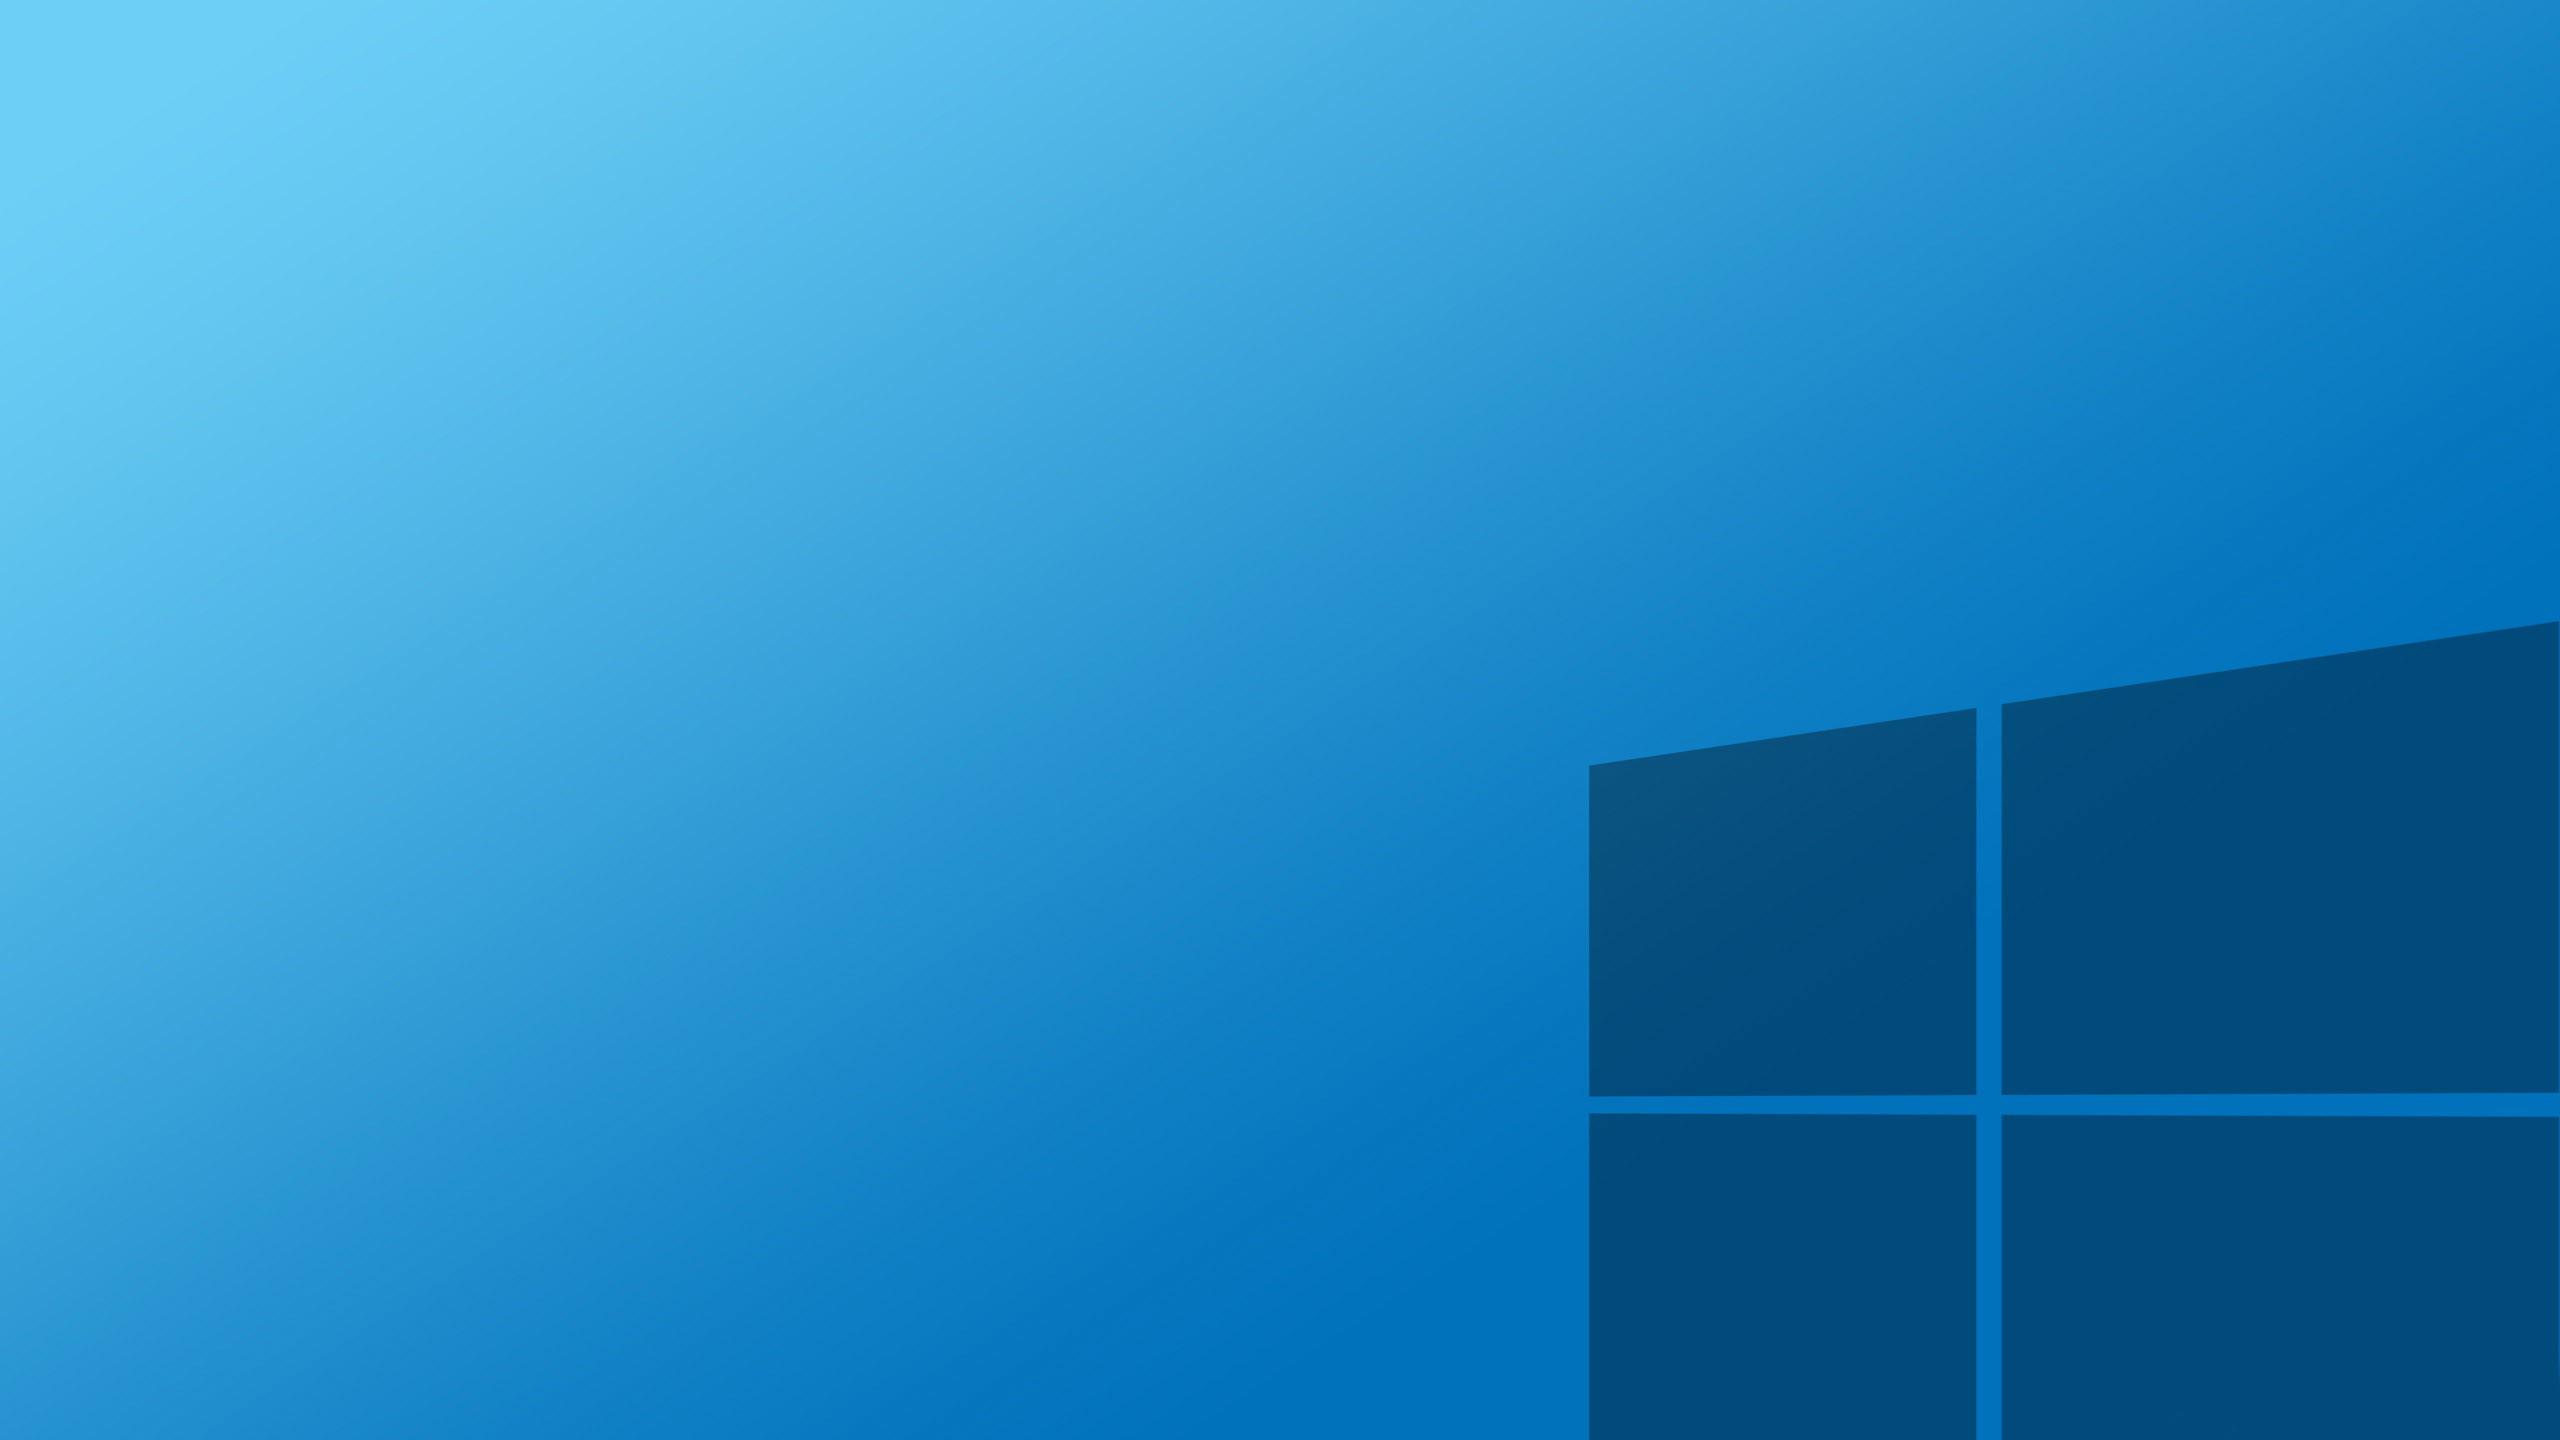 windows 10 backgrounds hd